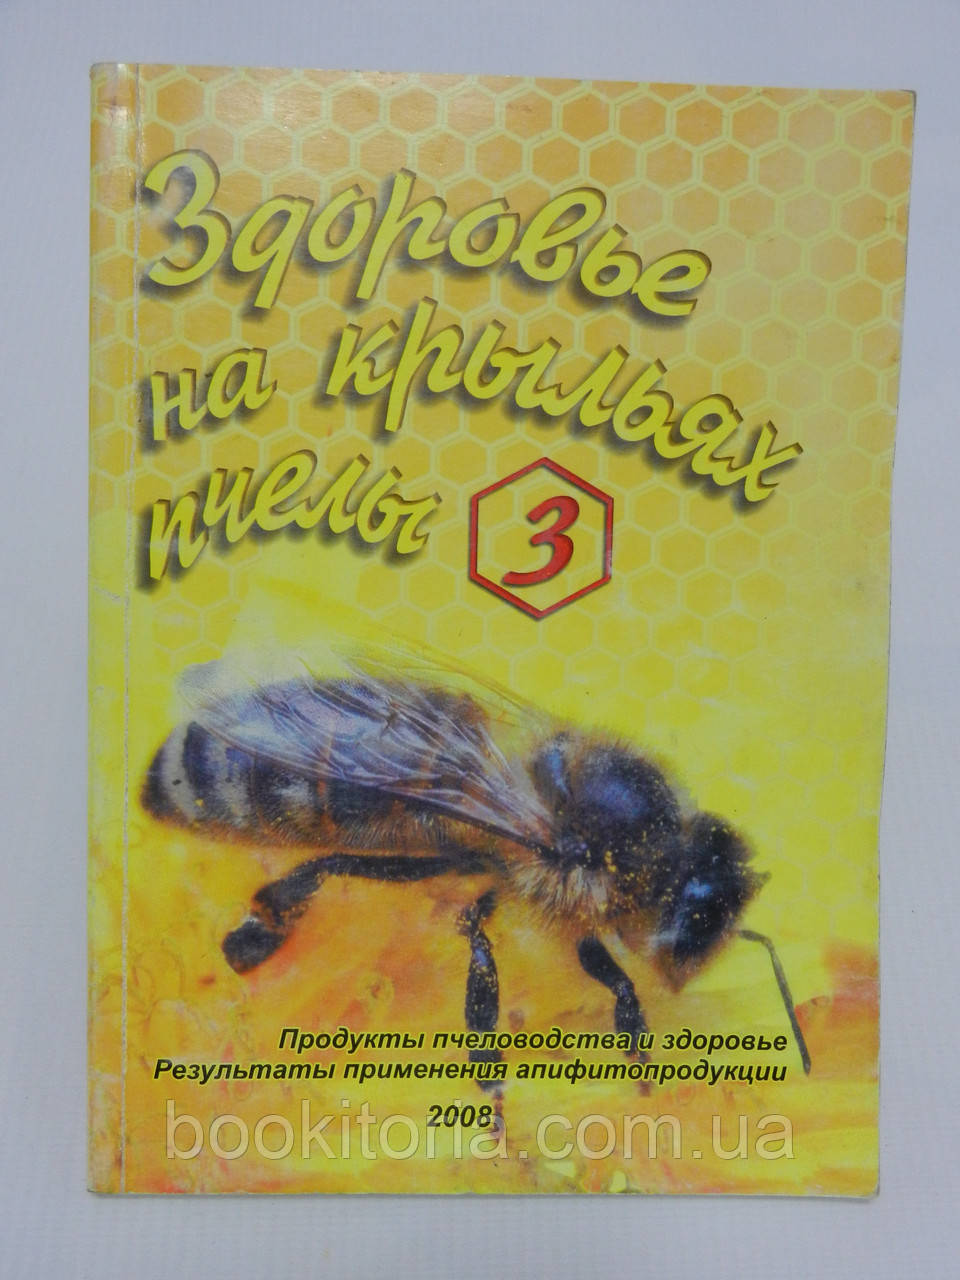 Здоровье на крыльях пчелы-3 (б/у).